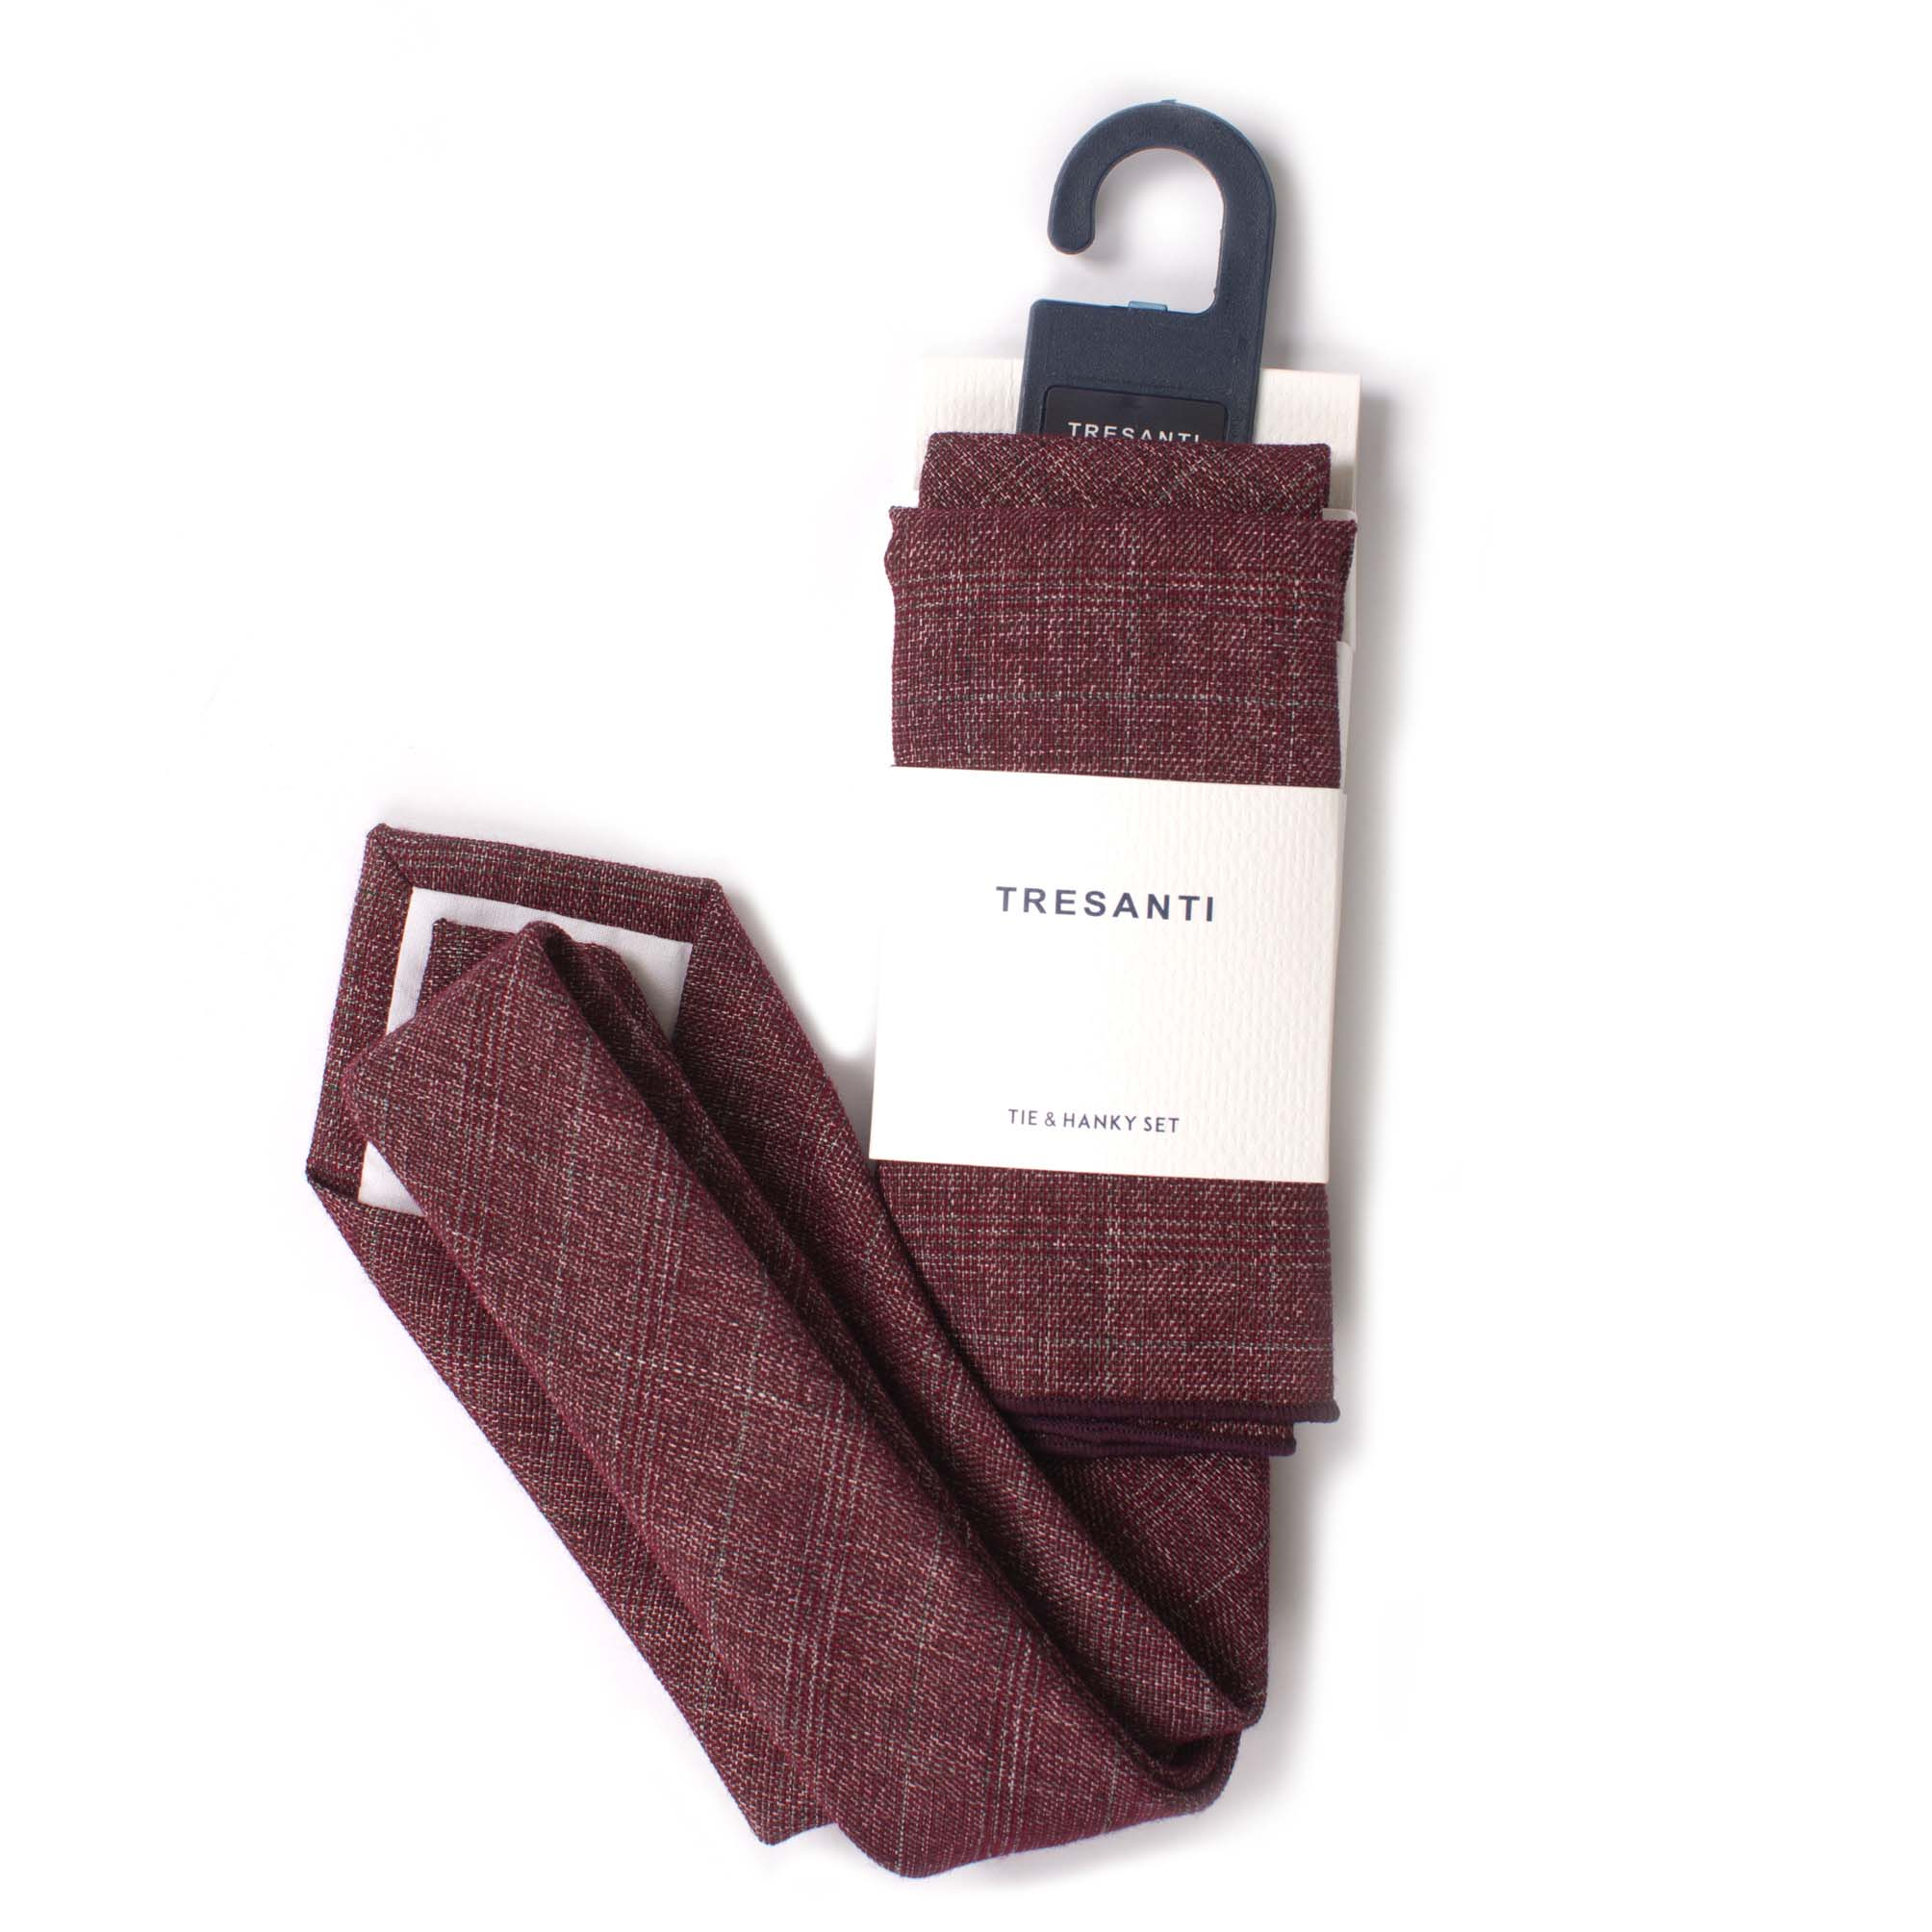 Tie & hanky set cotton